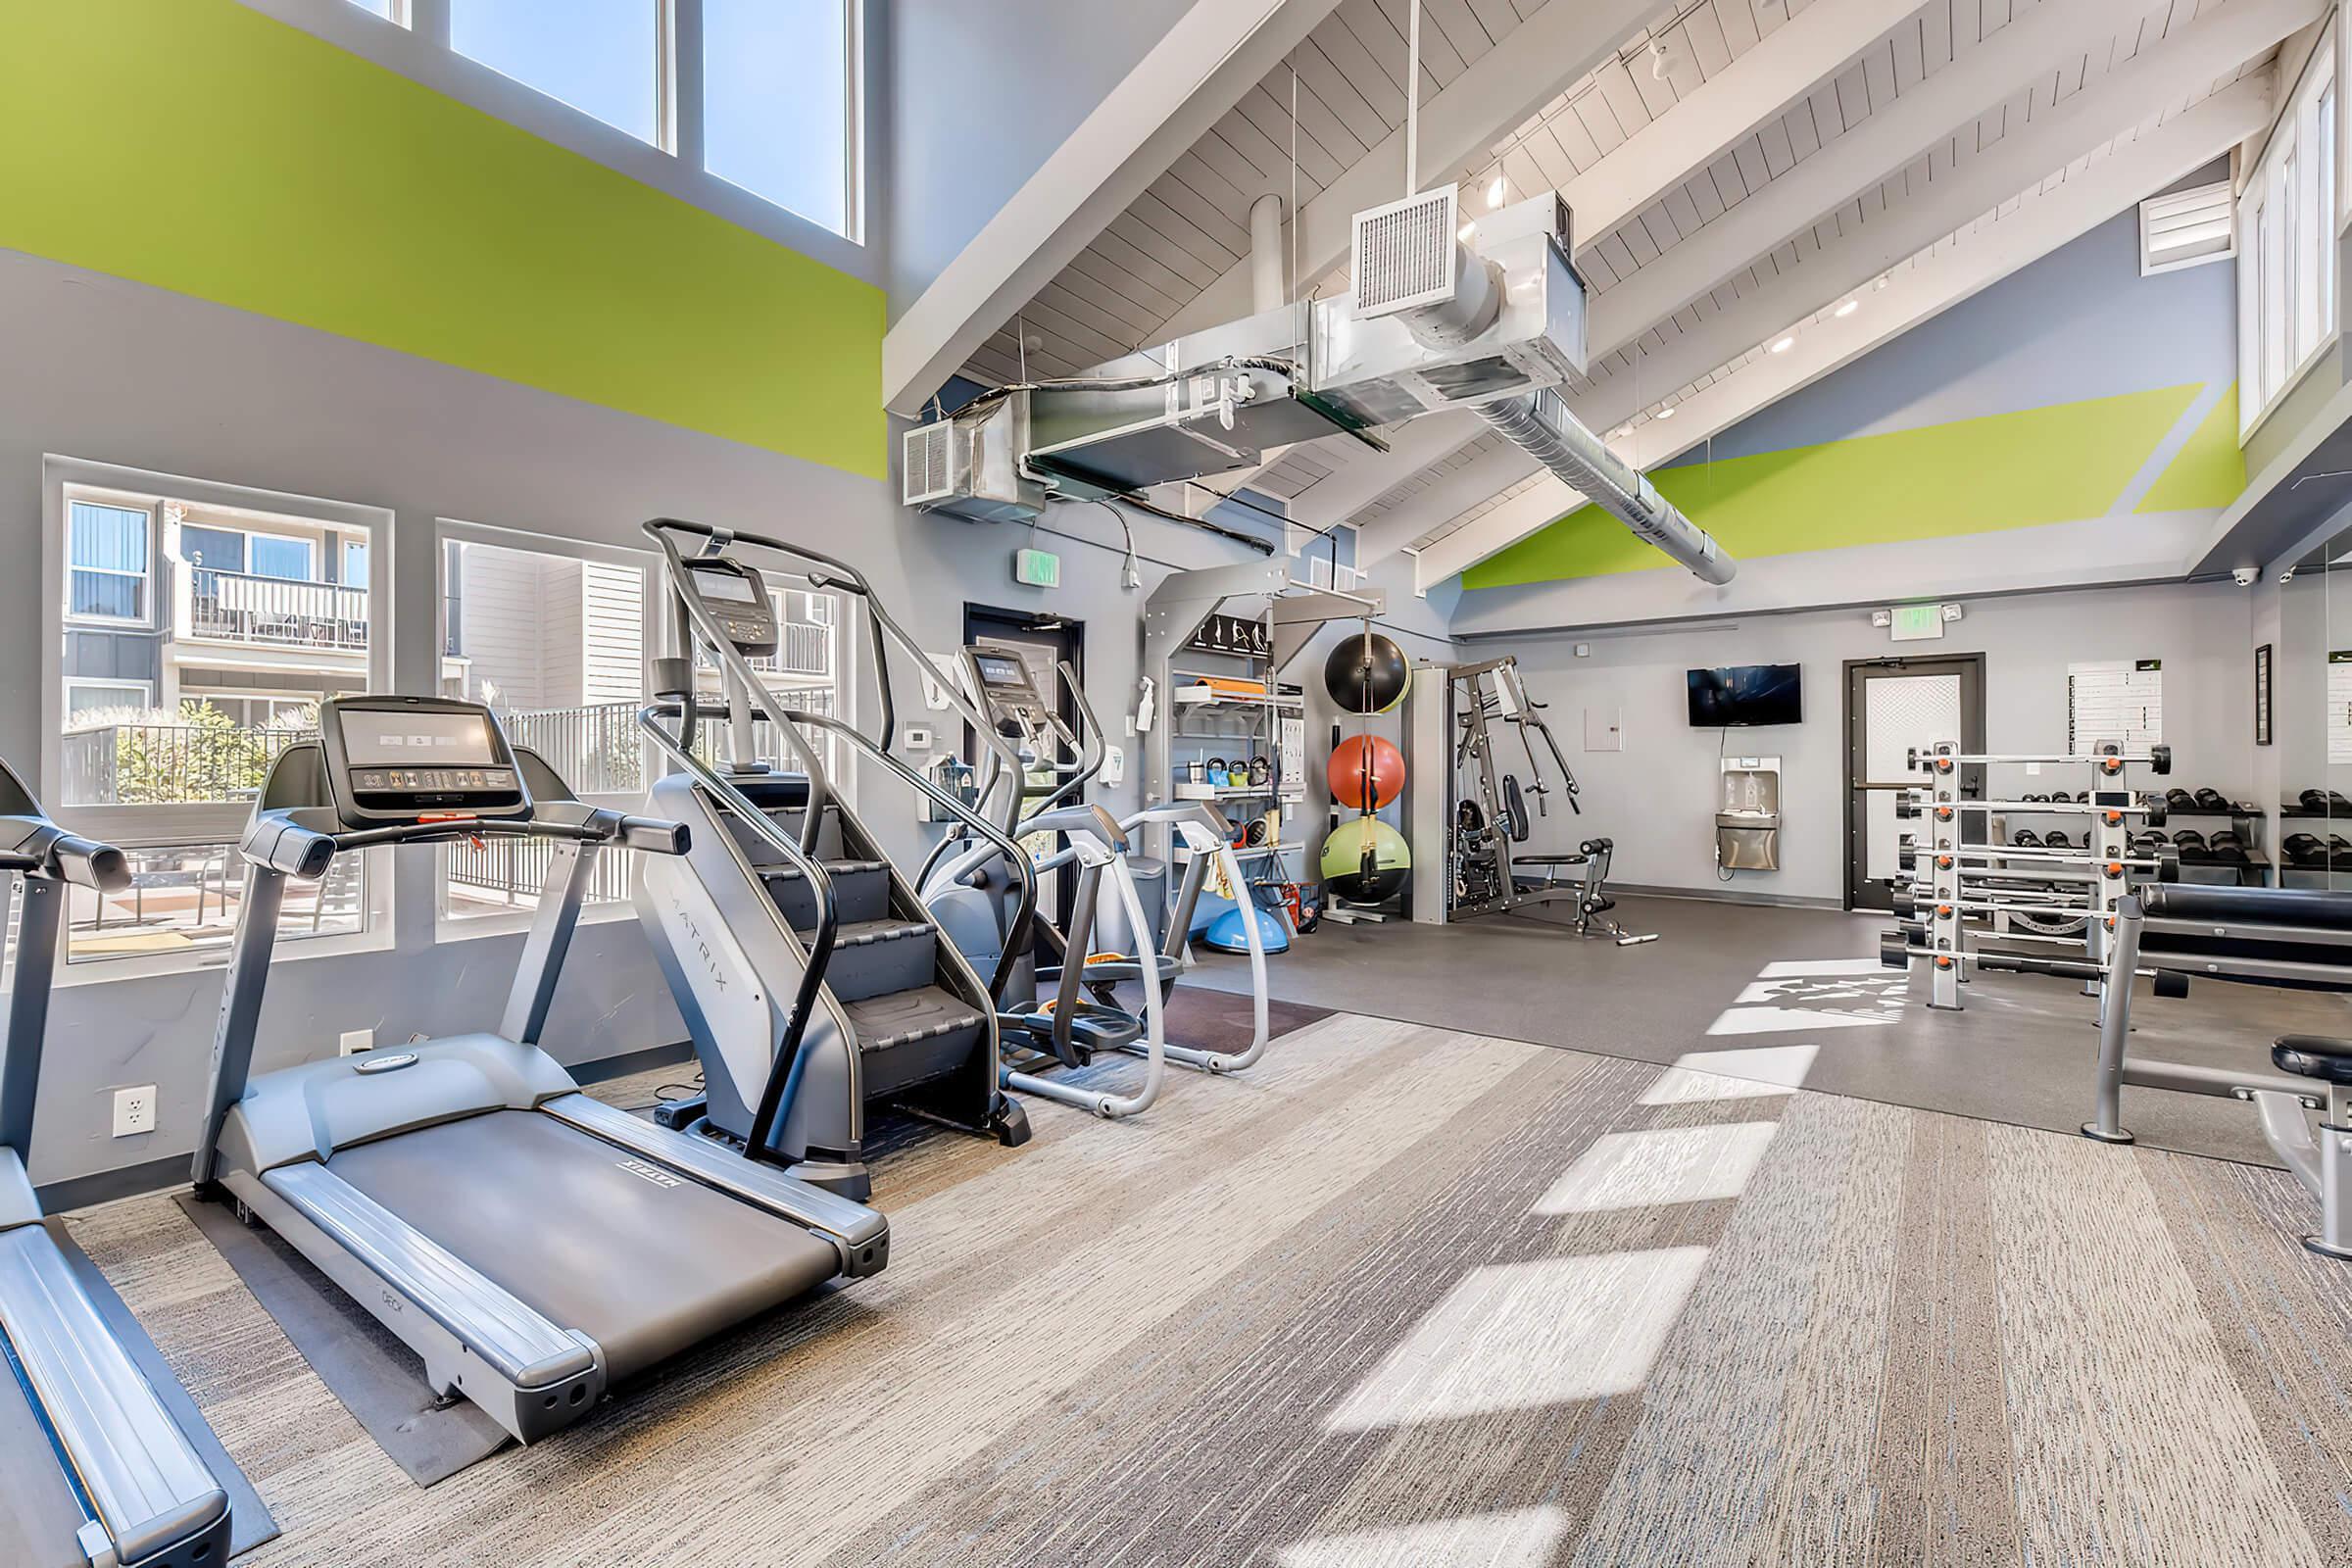 1801 E Girard Place Englewood-large-001-001-Exercise Room-1500x1000-72dpi.jpg